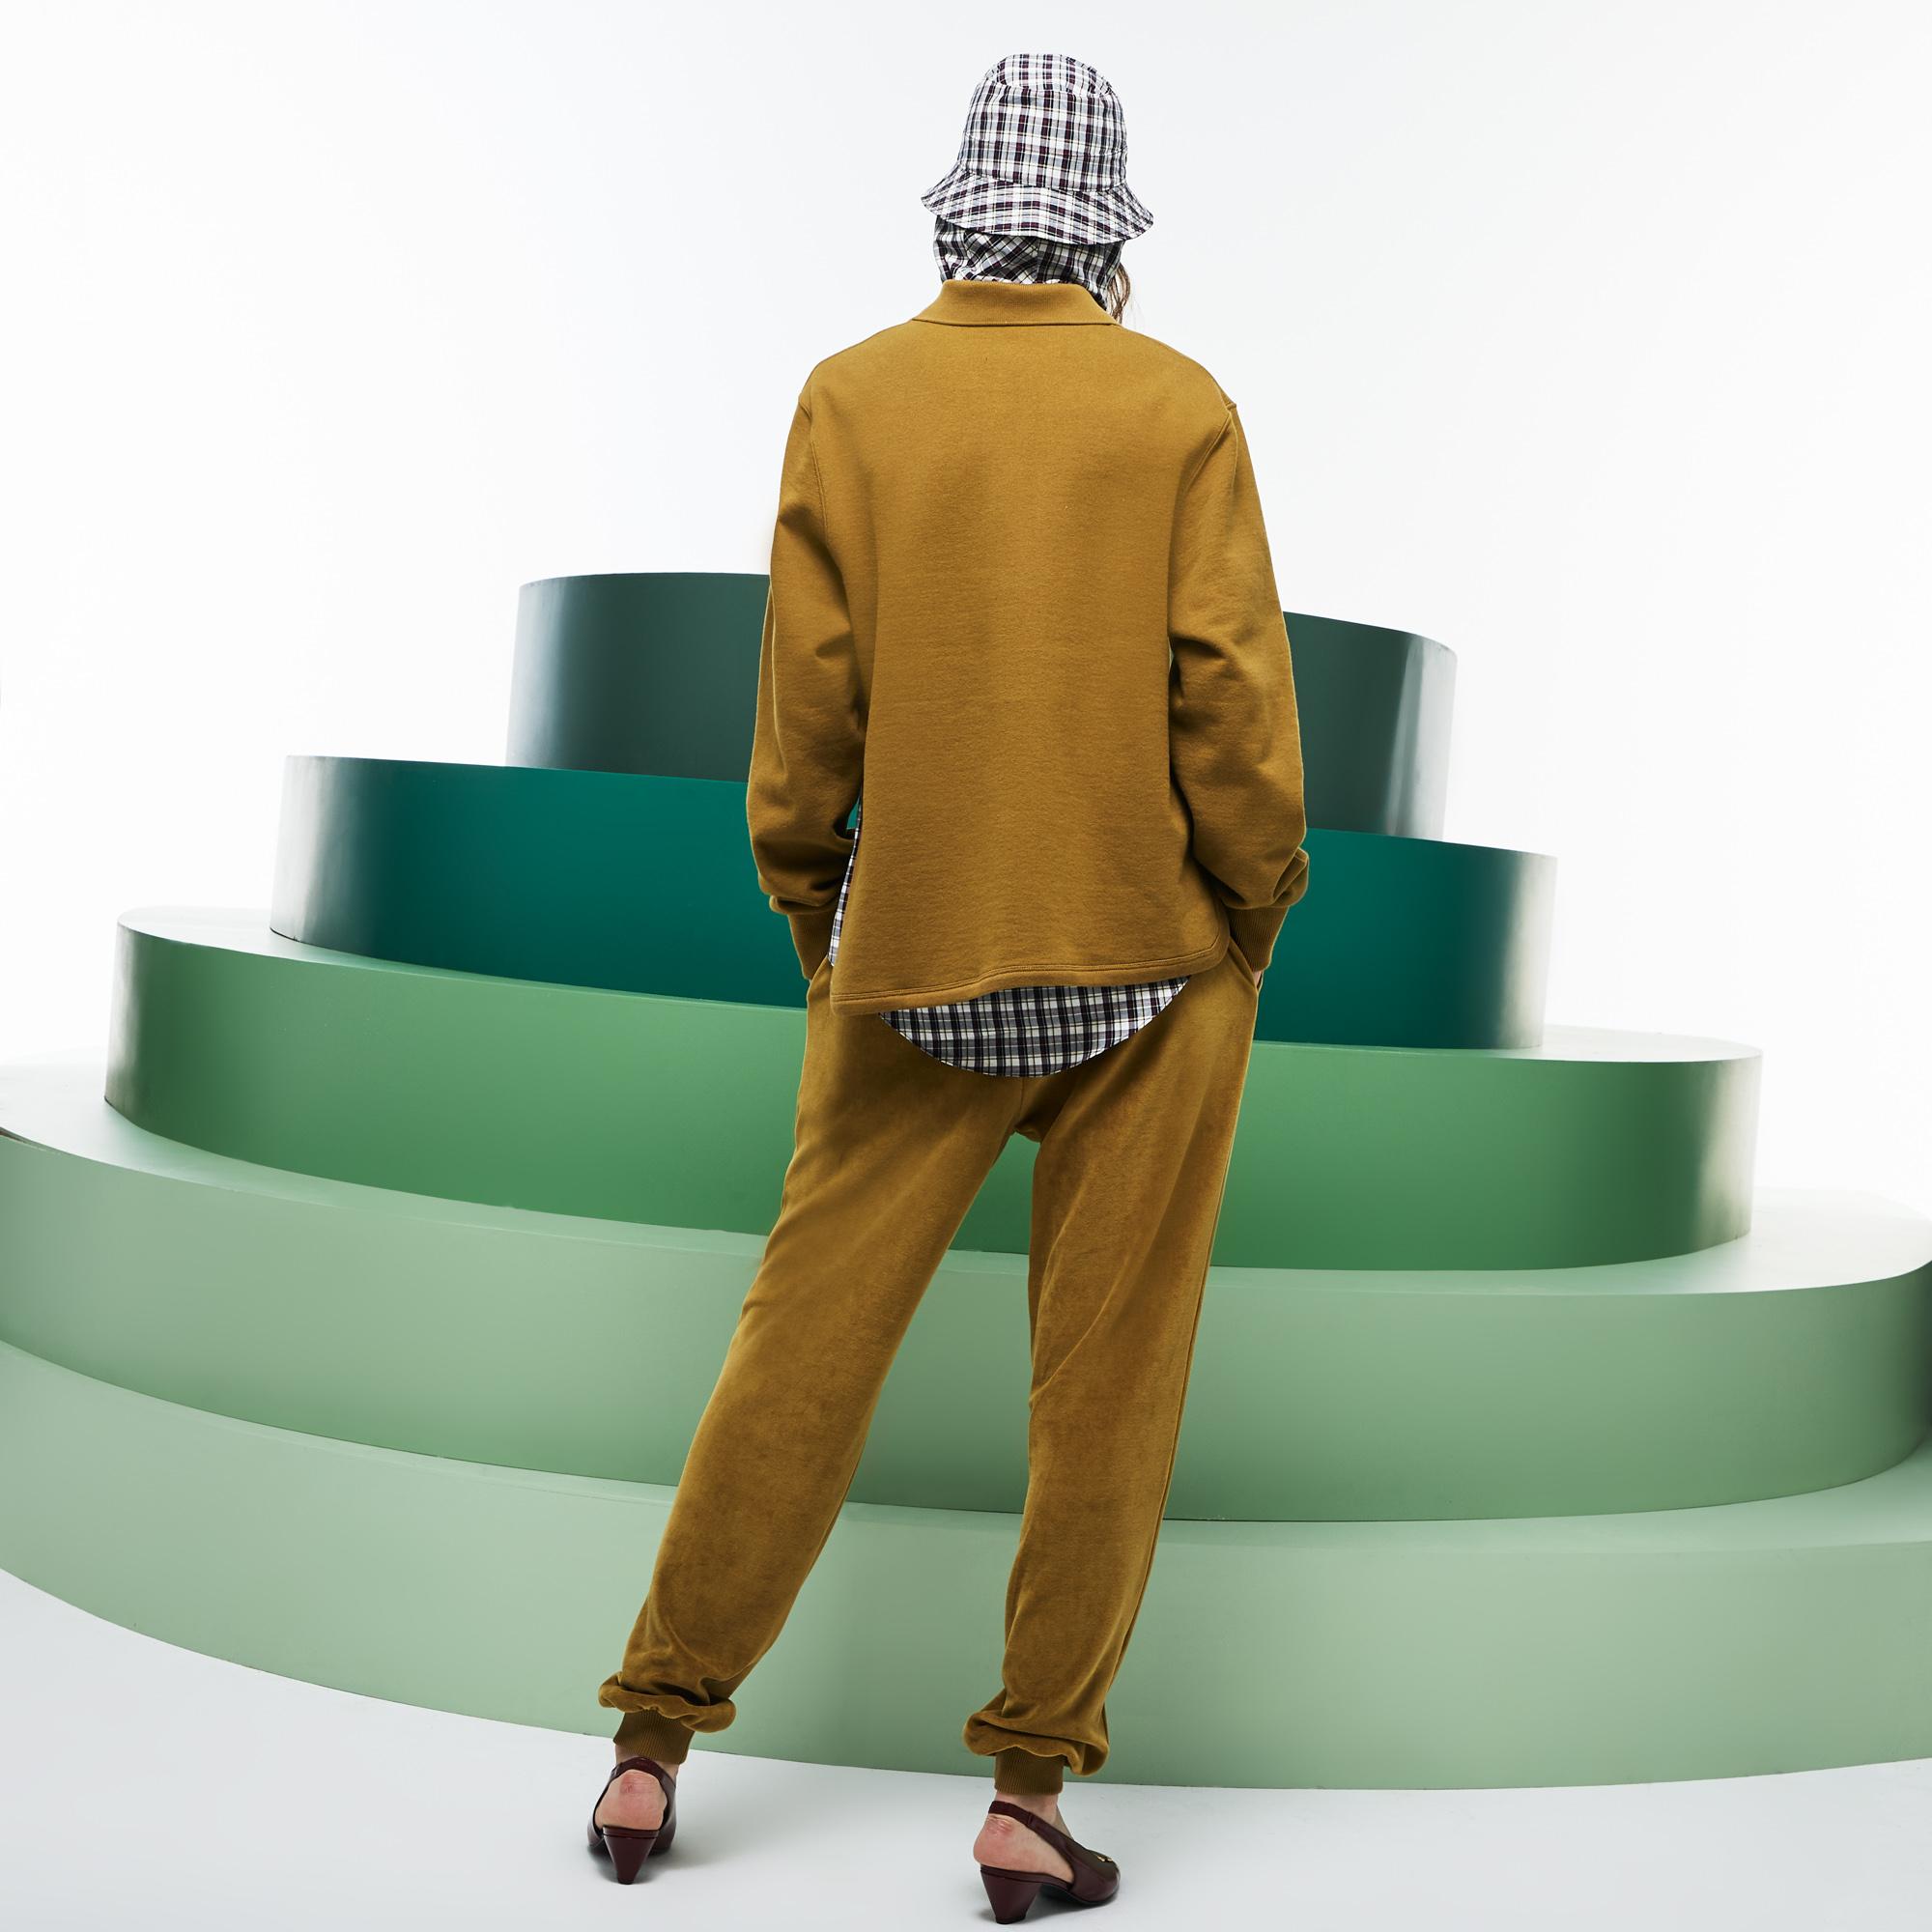 Фото 3 - Спортивные штаны Lacoste коричневого цвета